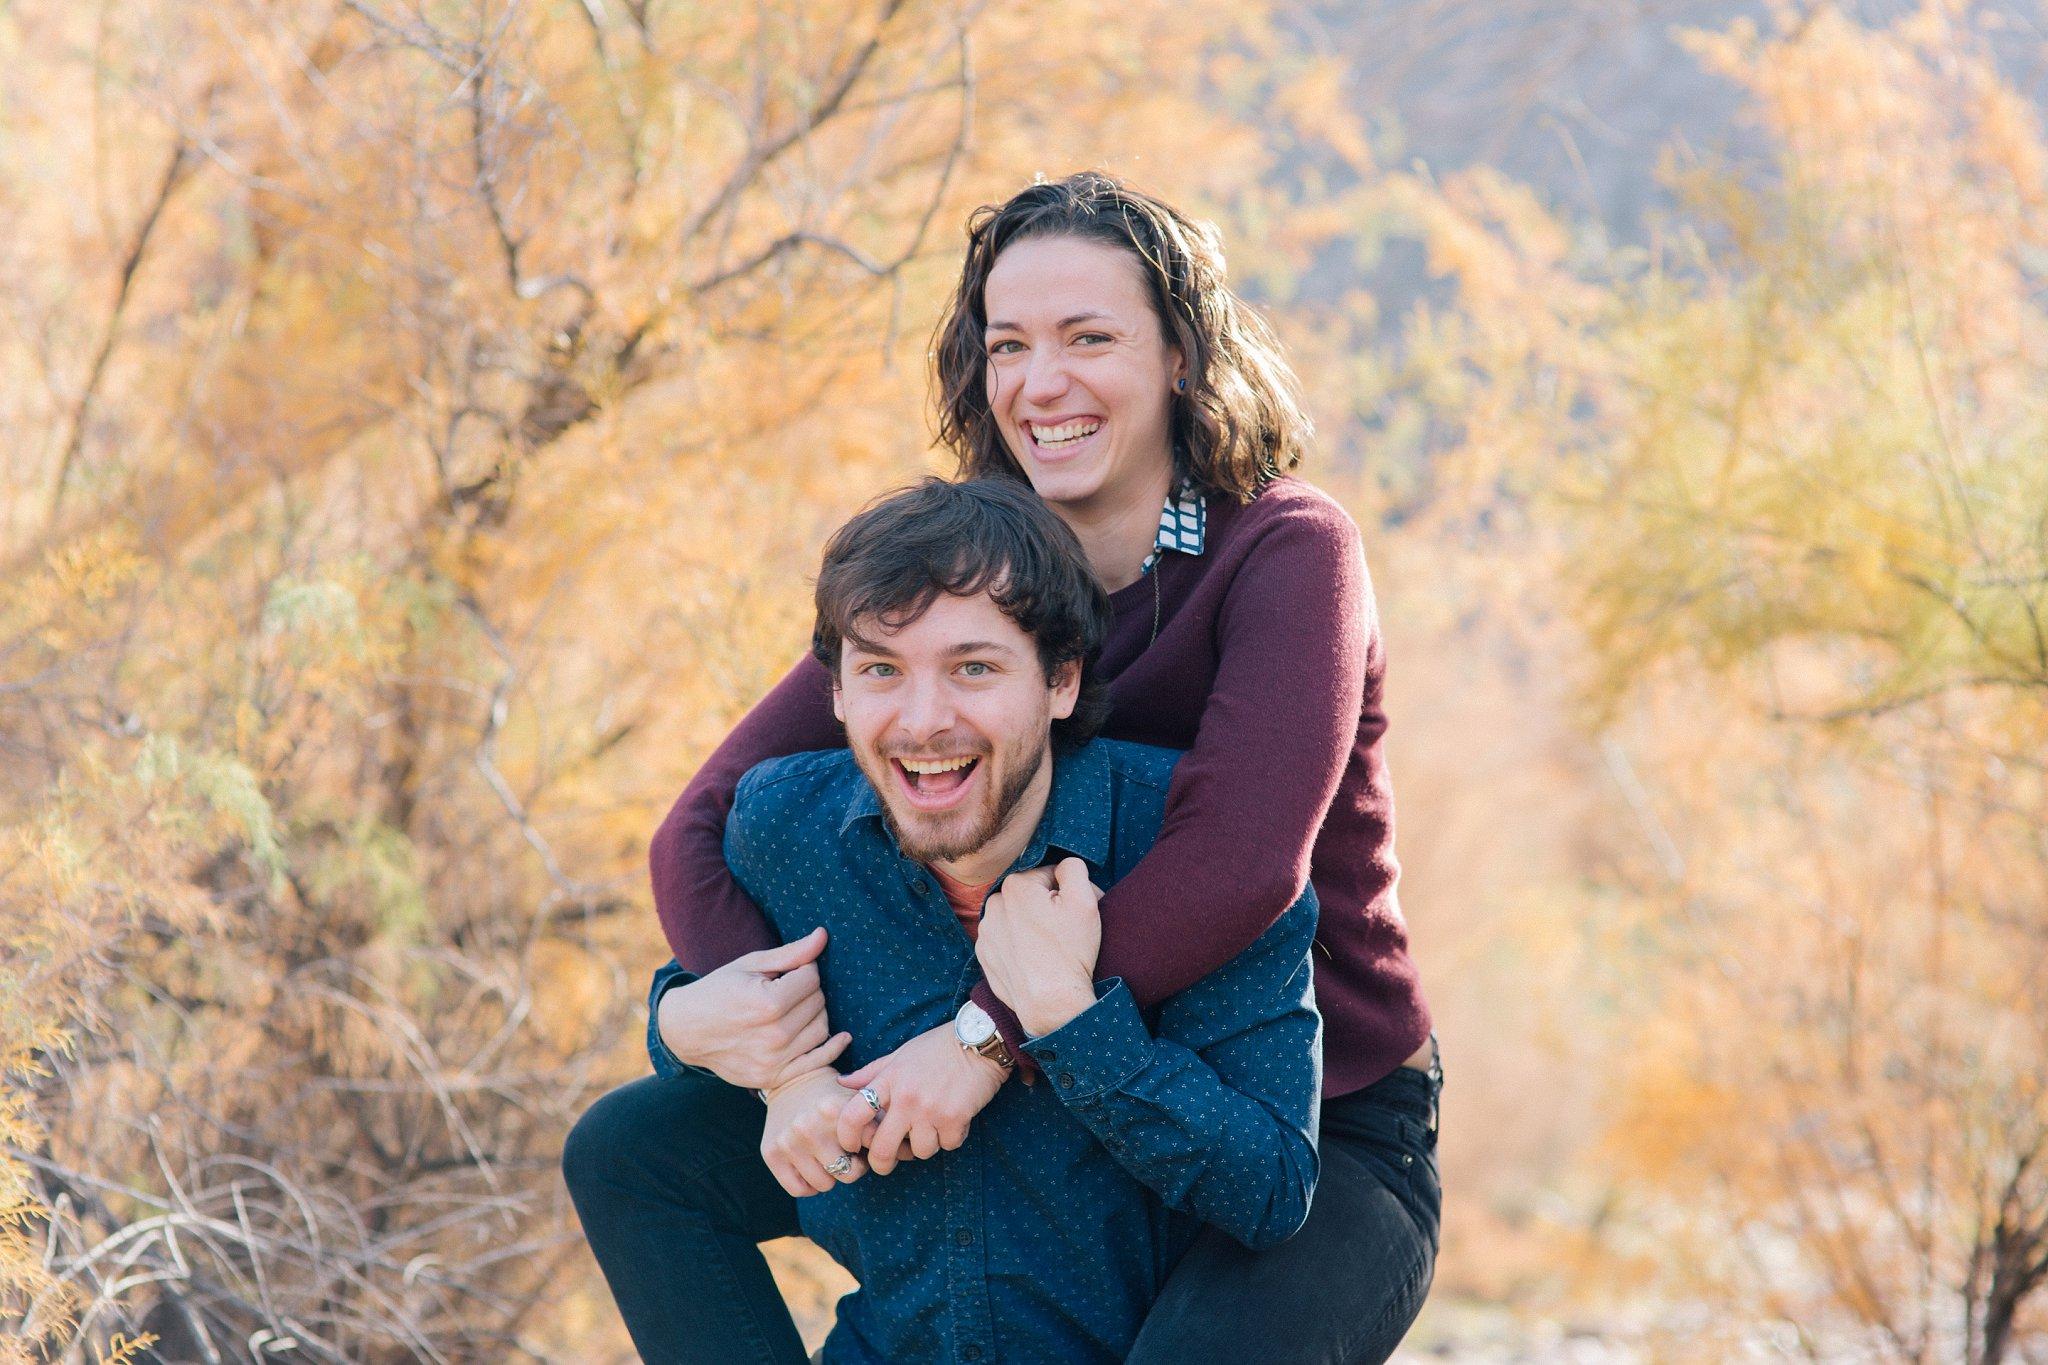 fun, lively engagement photos in Mesa, AZ